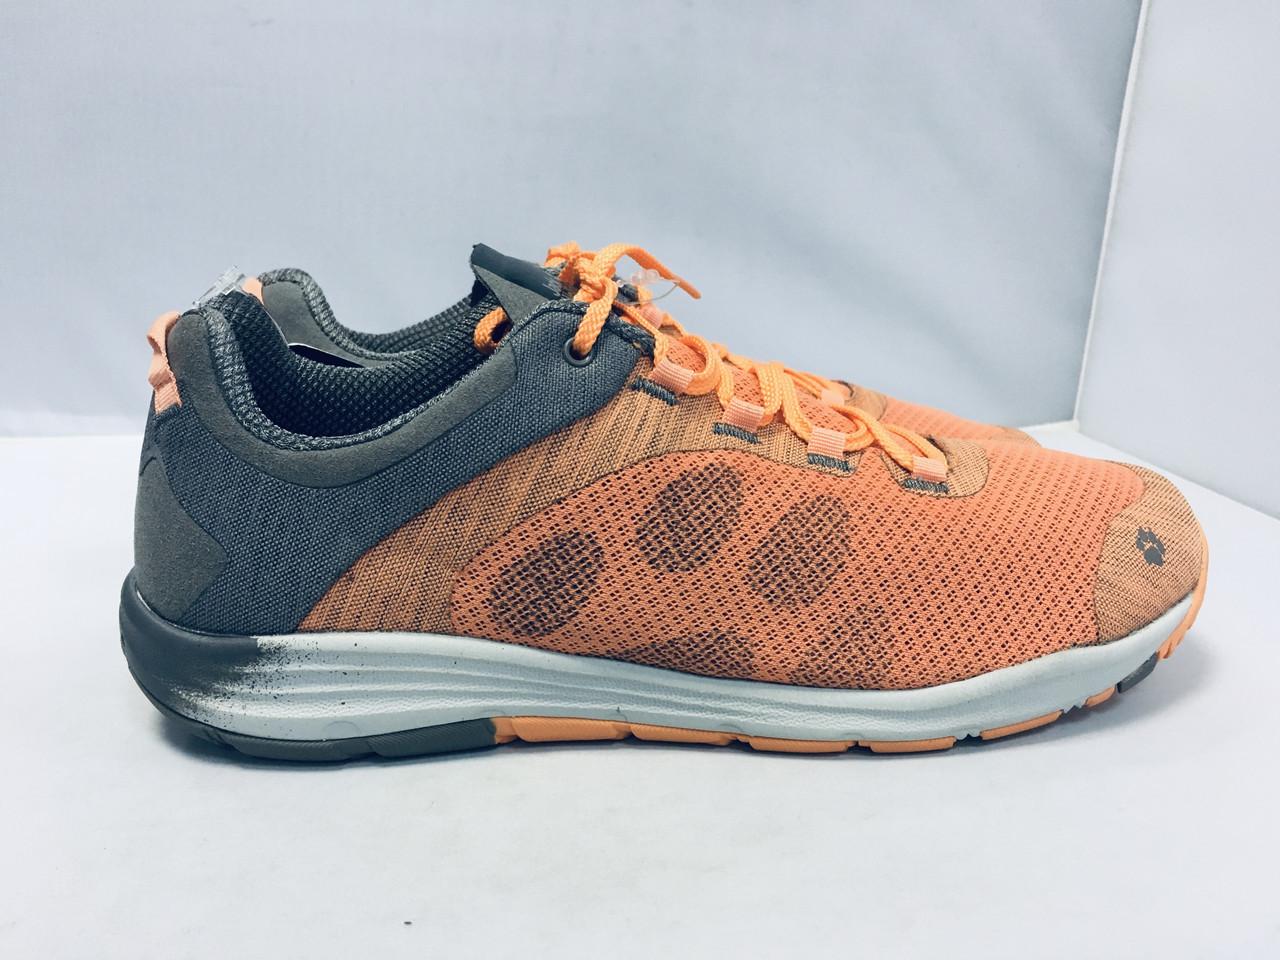 Женские кроссовки Jack Wolfskin, 40,5 размер